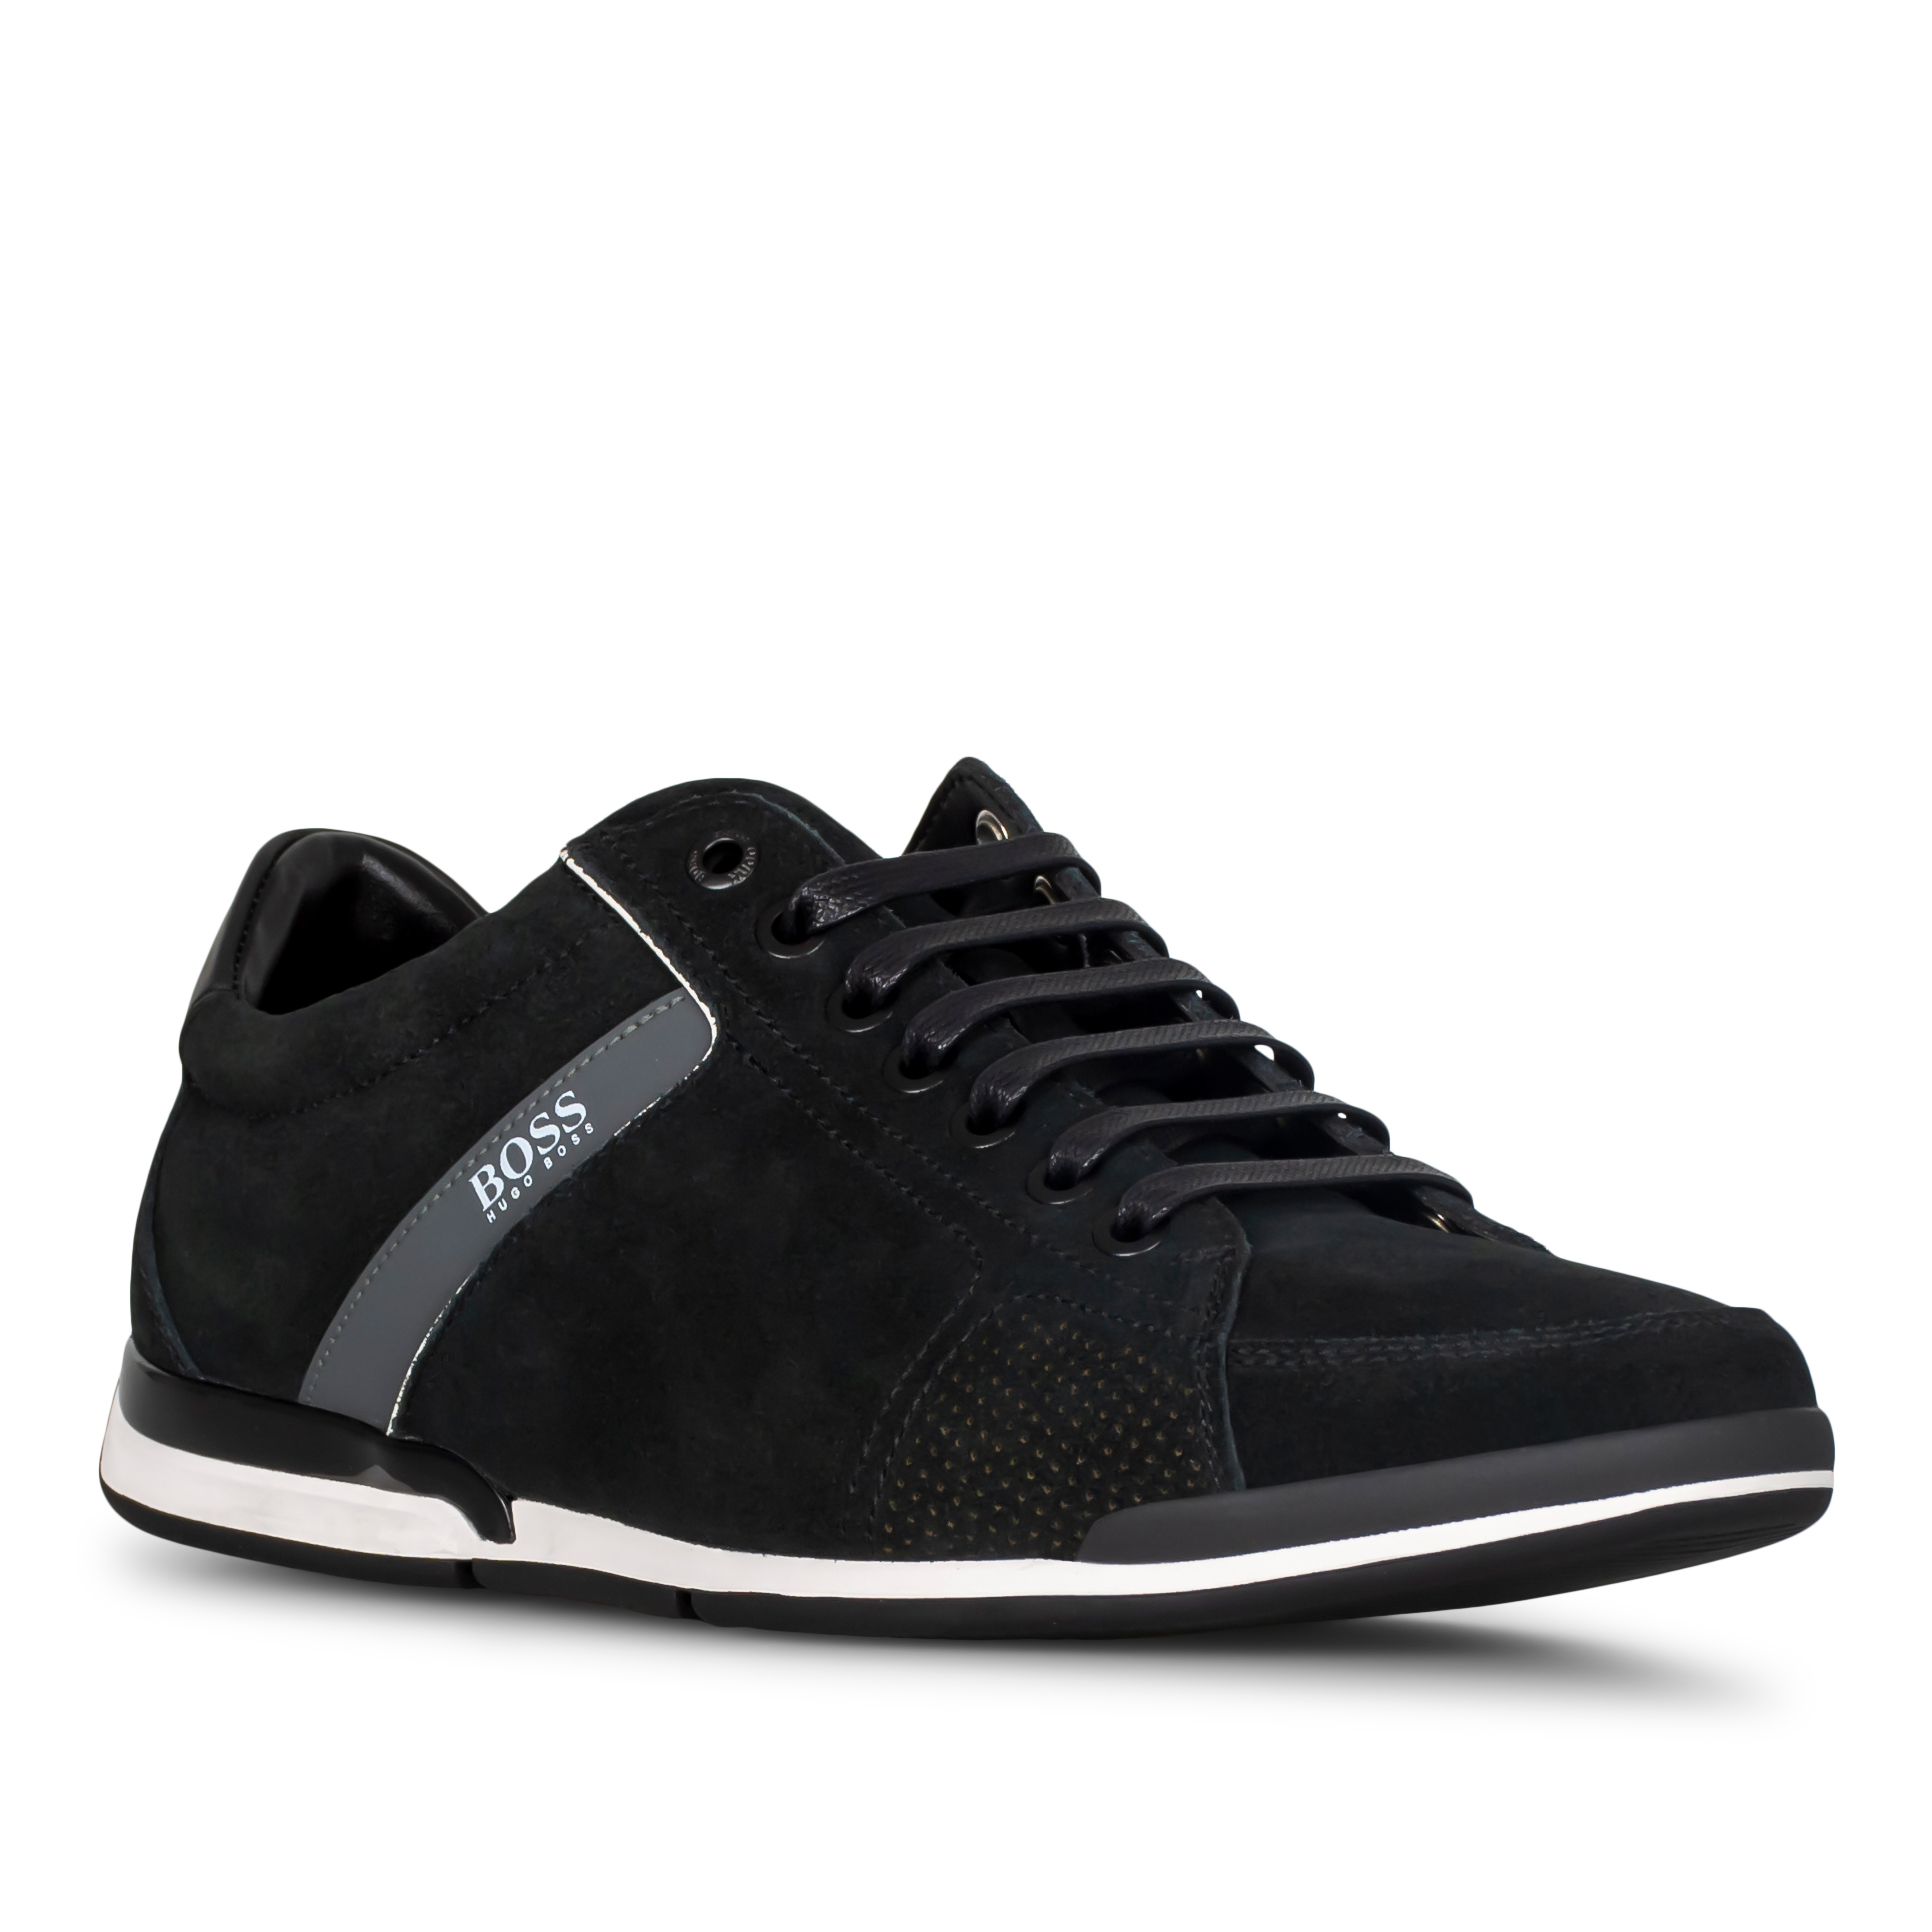 Hugo Boss Saturn sneakers, black, 43